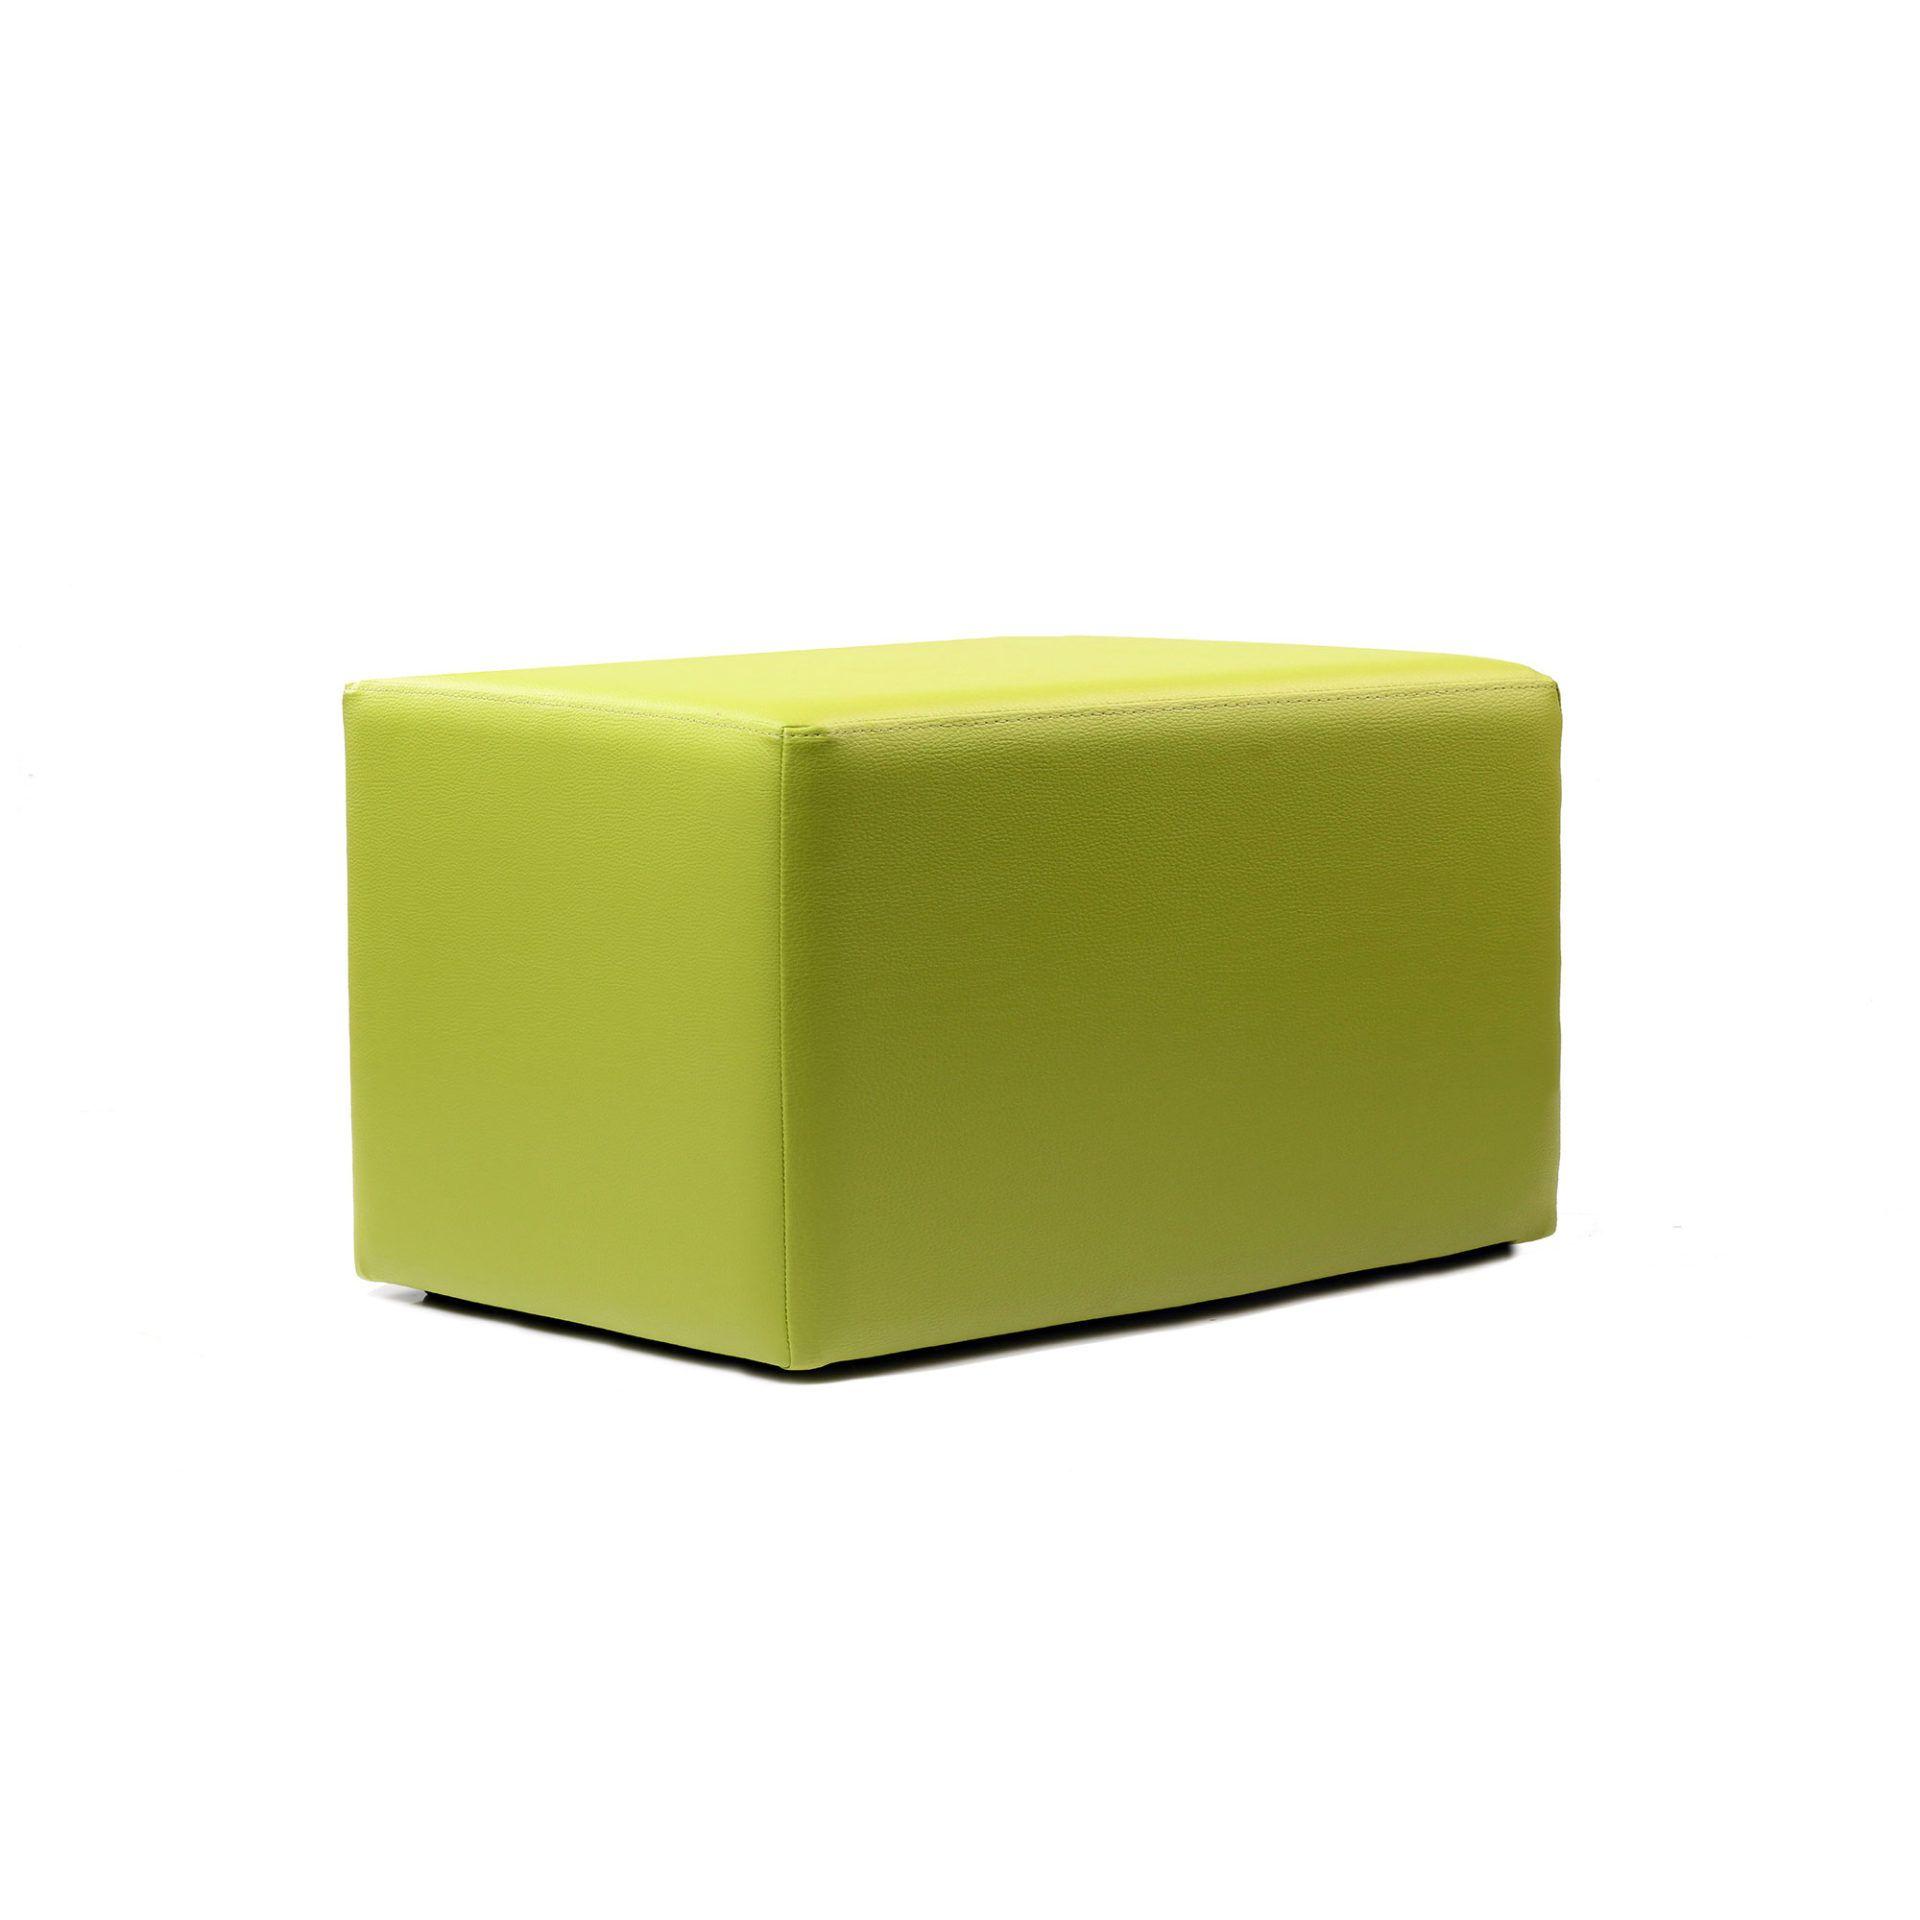 ottoman rectangle green02